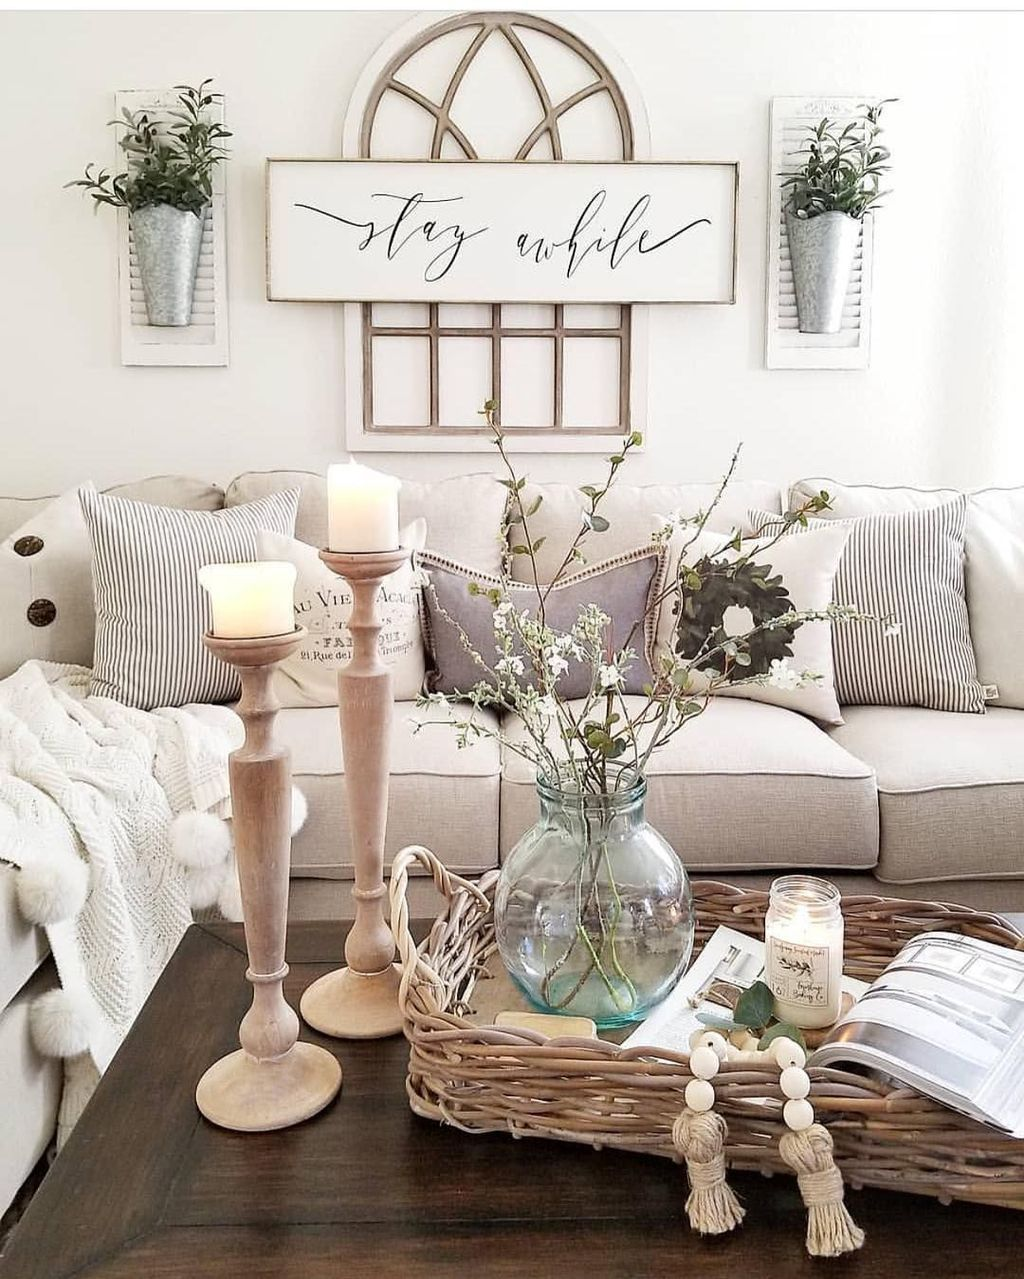 Excellent modern farmhouse interior design ideas in barndominium pinterest room living and designs also rh